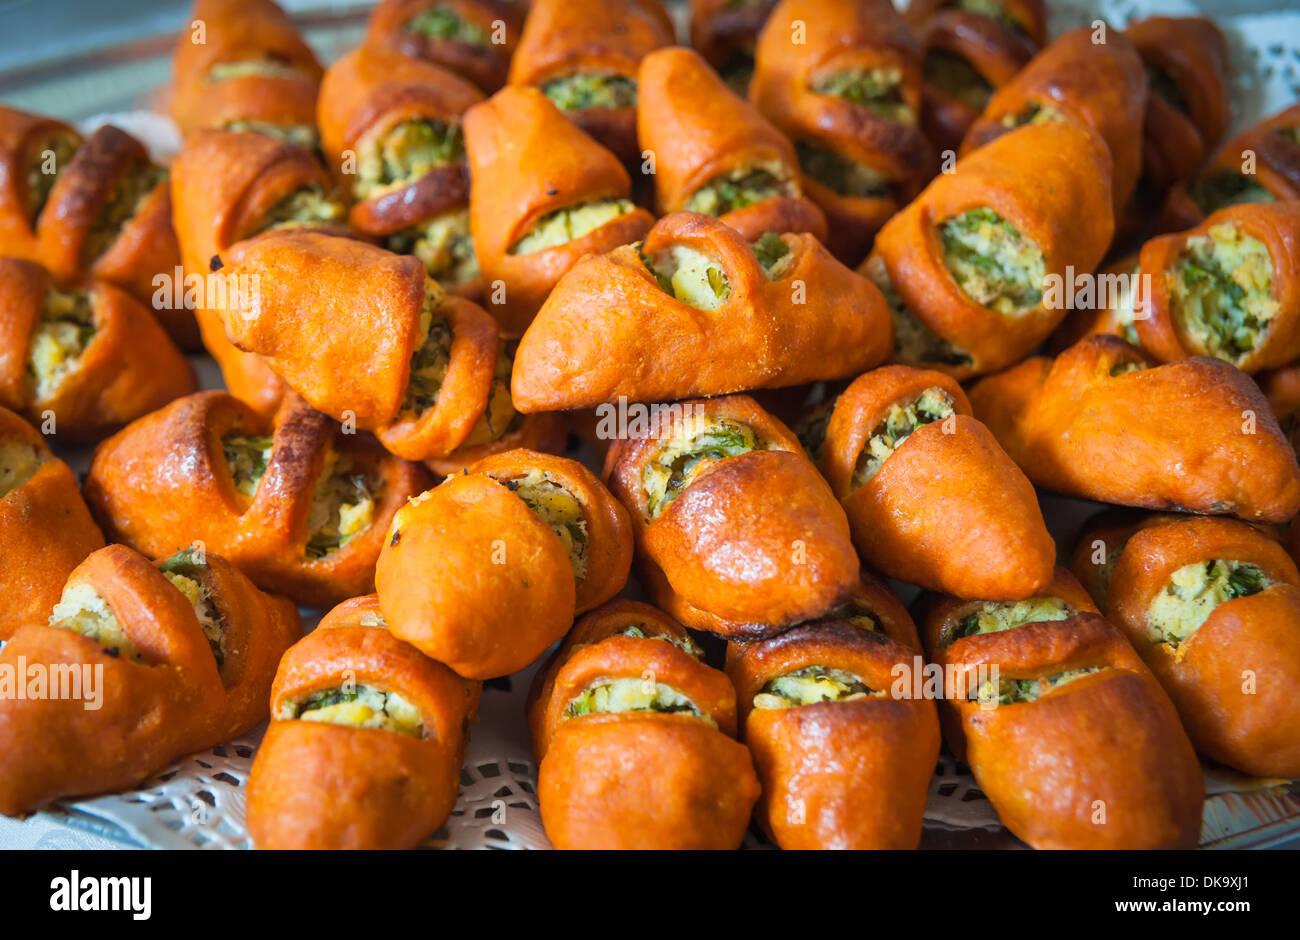 Delicious Turkish pogaca savory mashed patatoes pastry - Stock Image